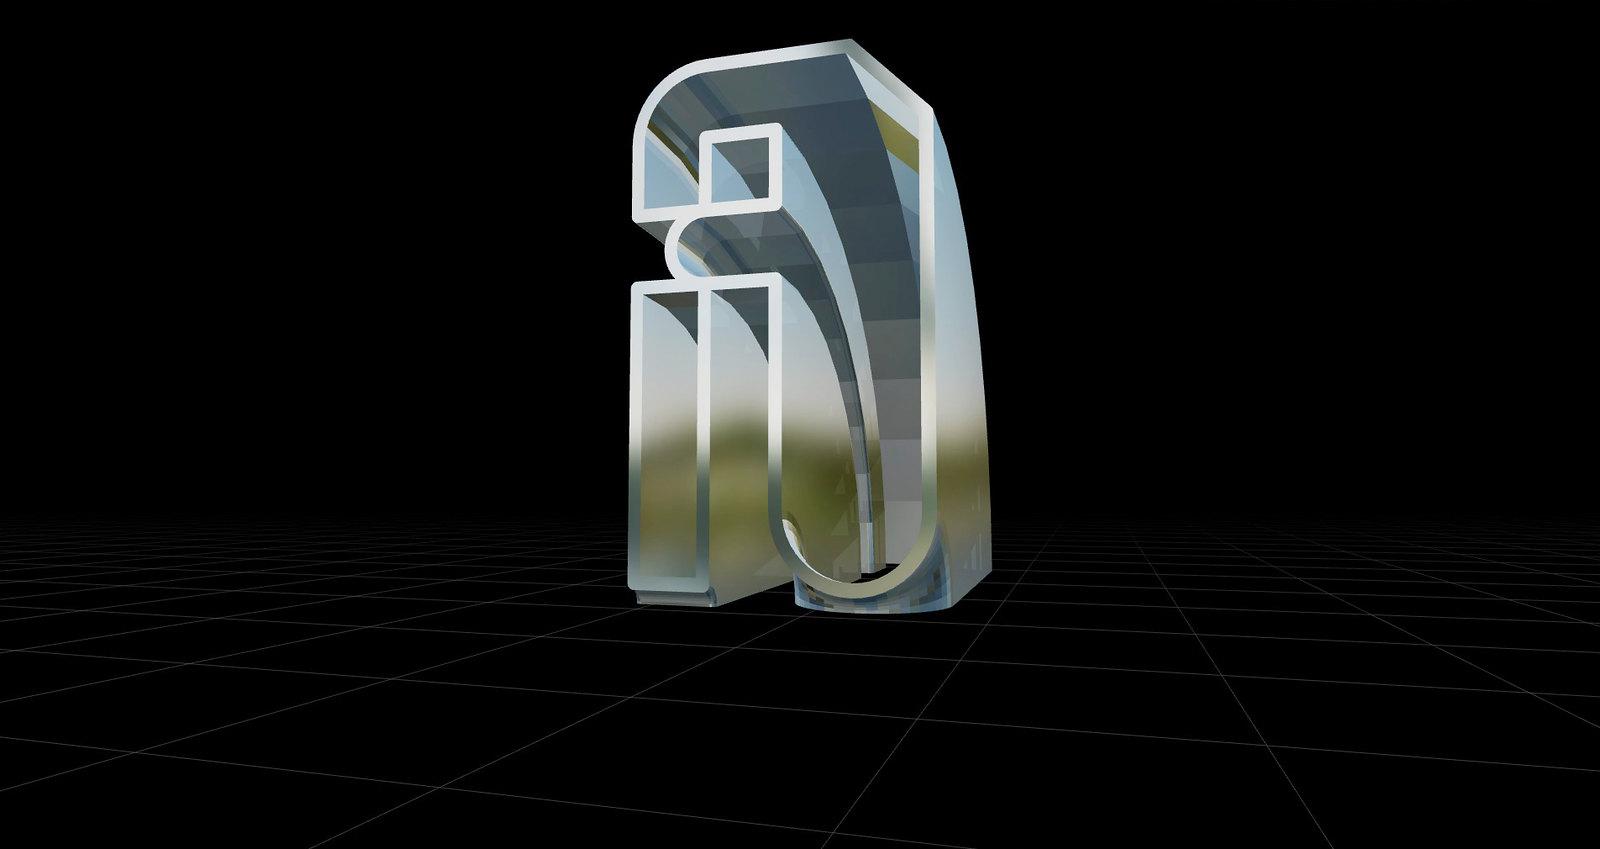 Caracteres tipográficos 3D letra A-letra-a-variaciones